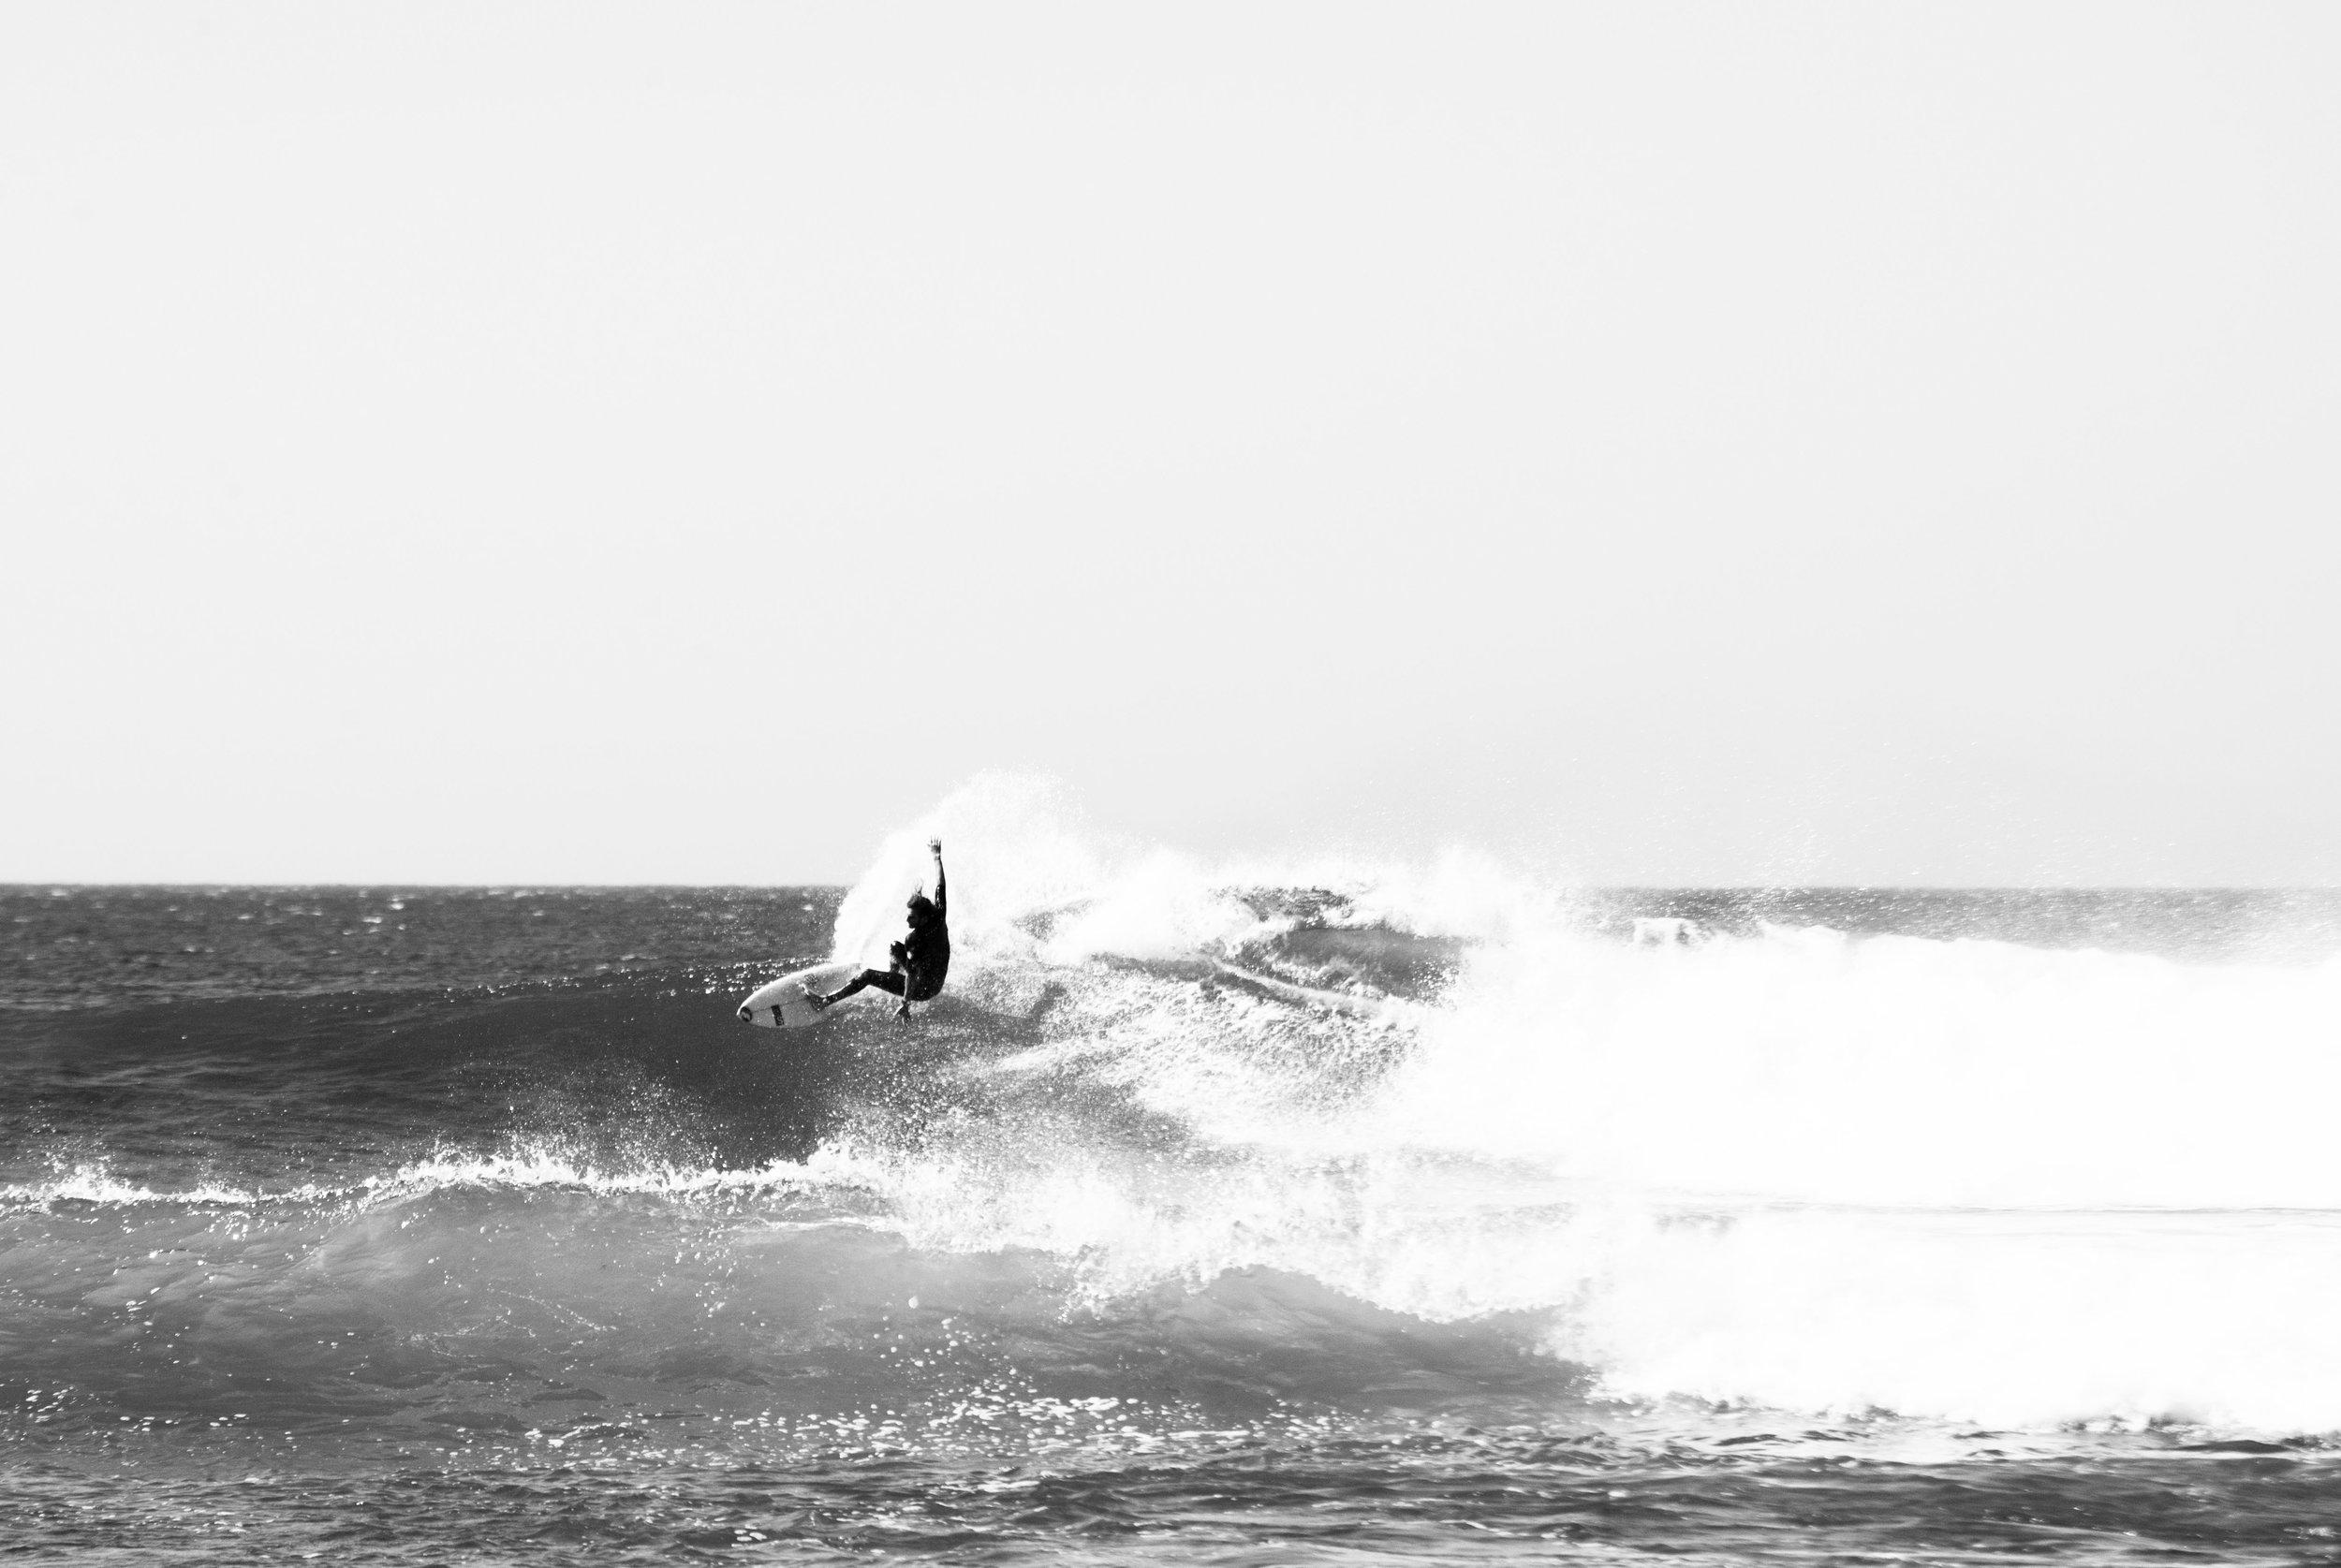 salt water surftrip popoyo 5